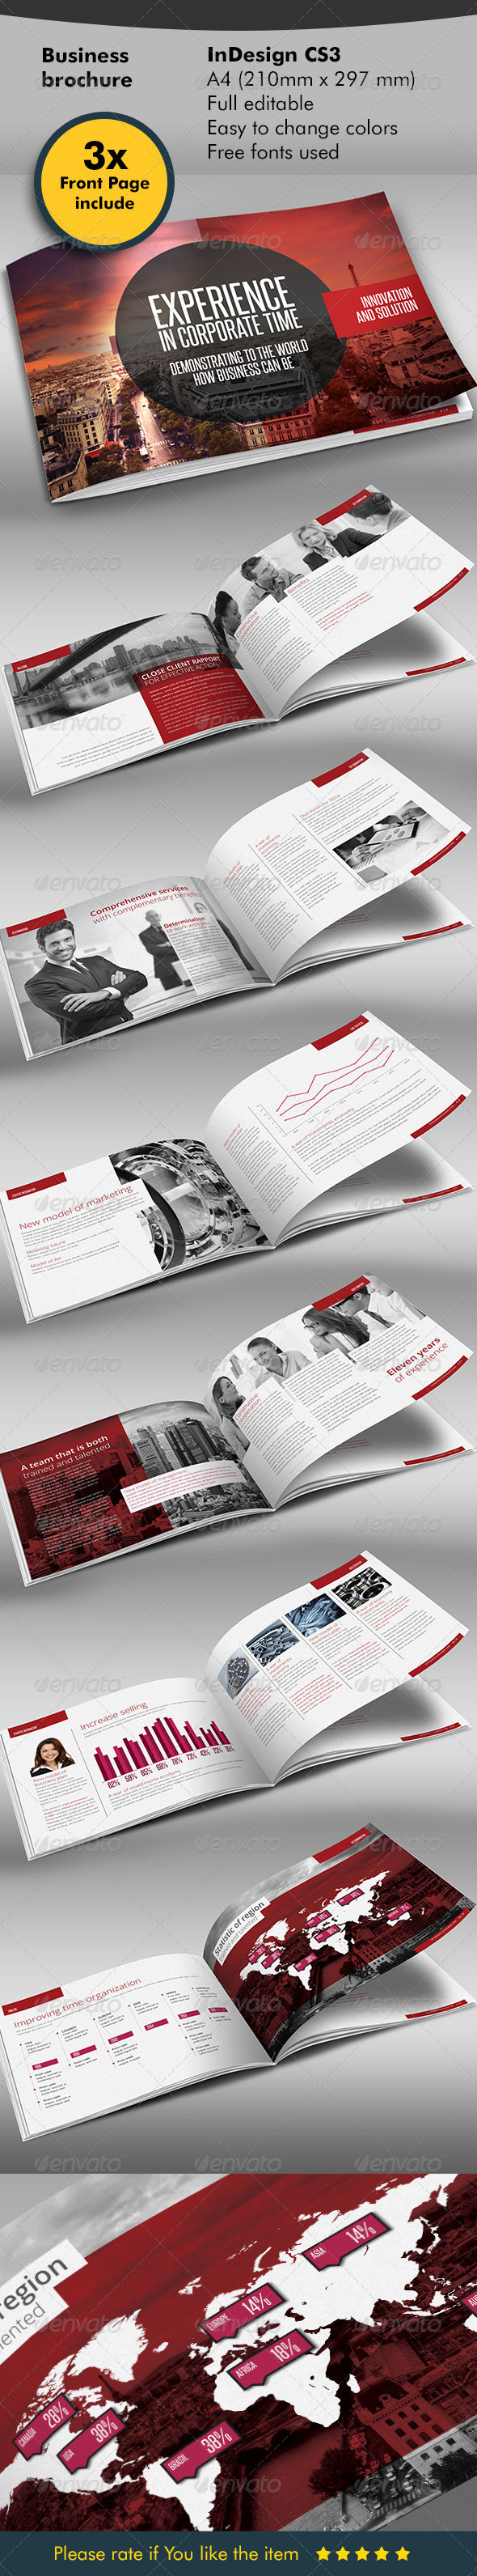 GraphicRiver Red Black Design Brochure 5986945